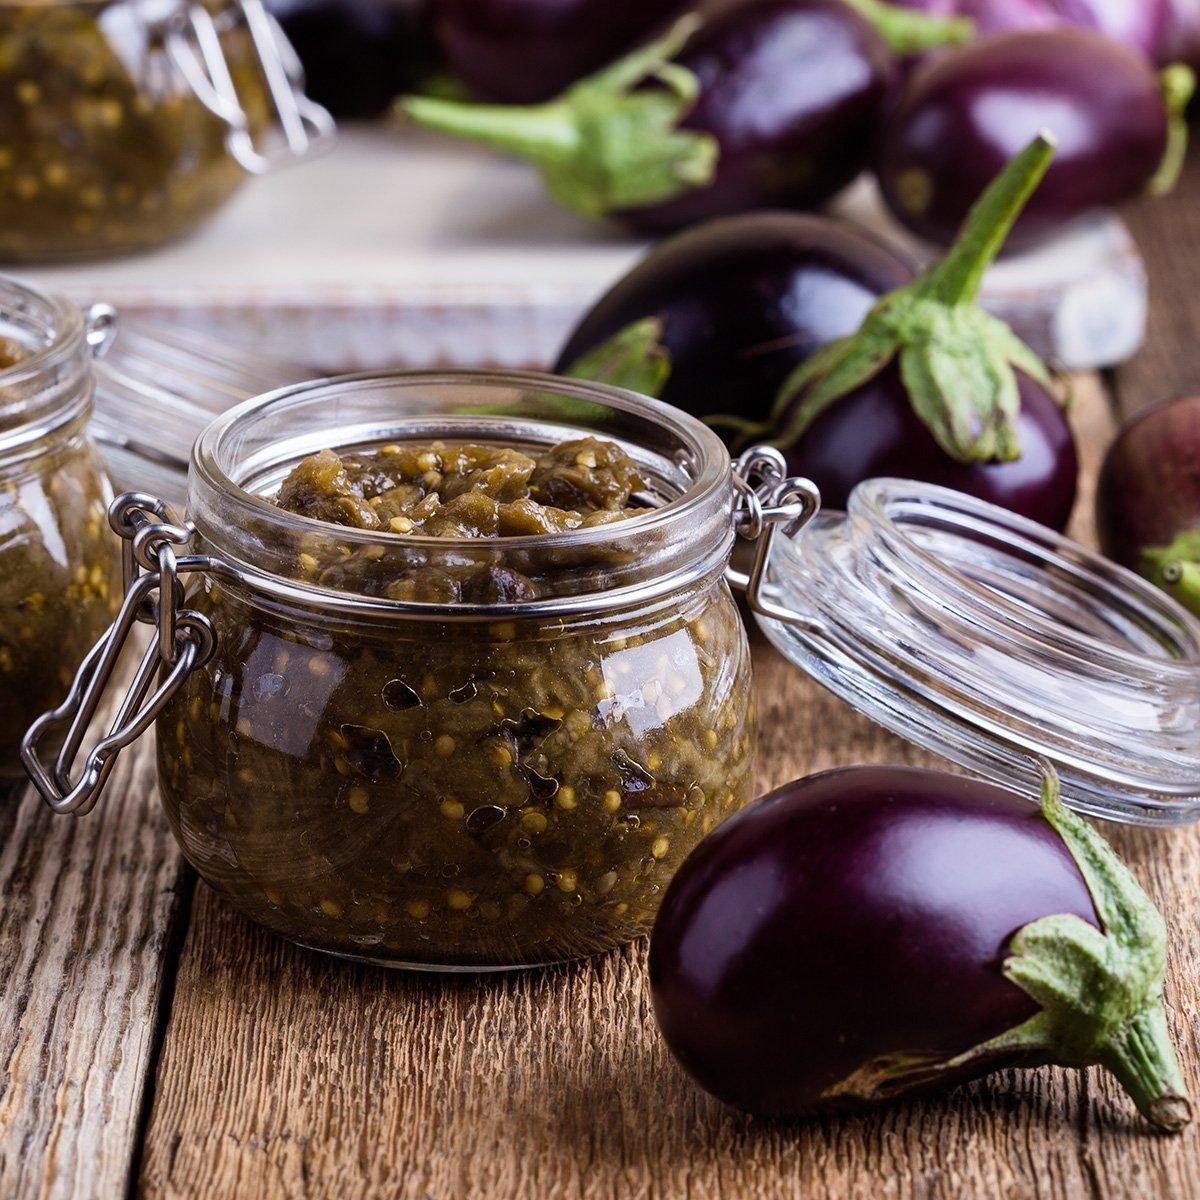 Eggplant preserves. Homemade vegetarian vegetable caviar in glass jar on rustic wooden table